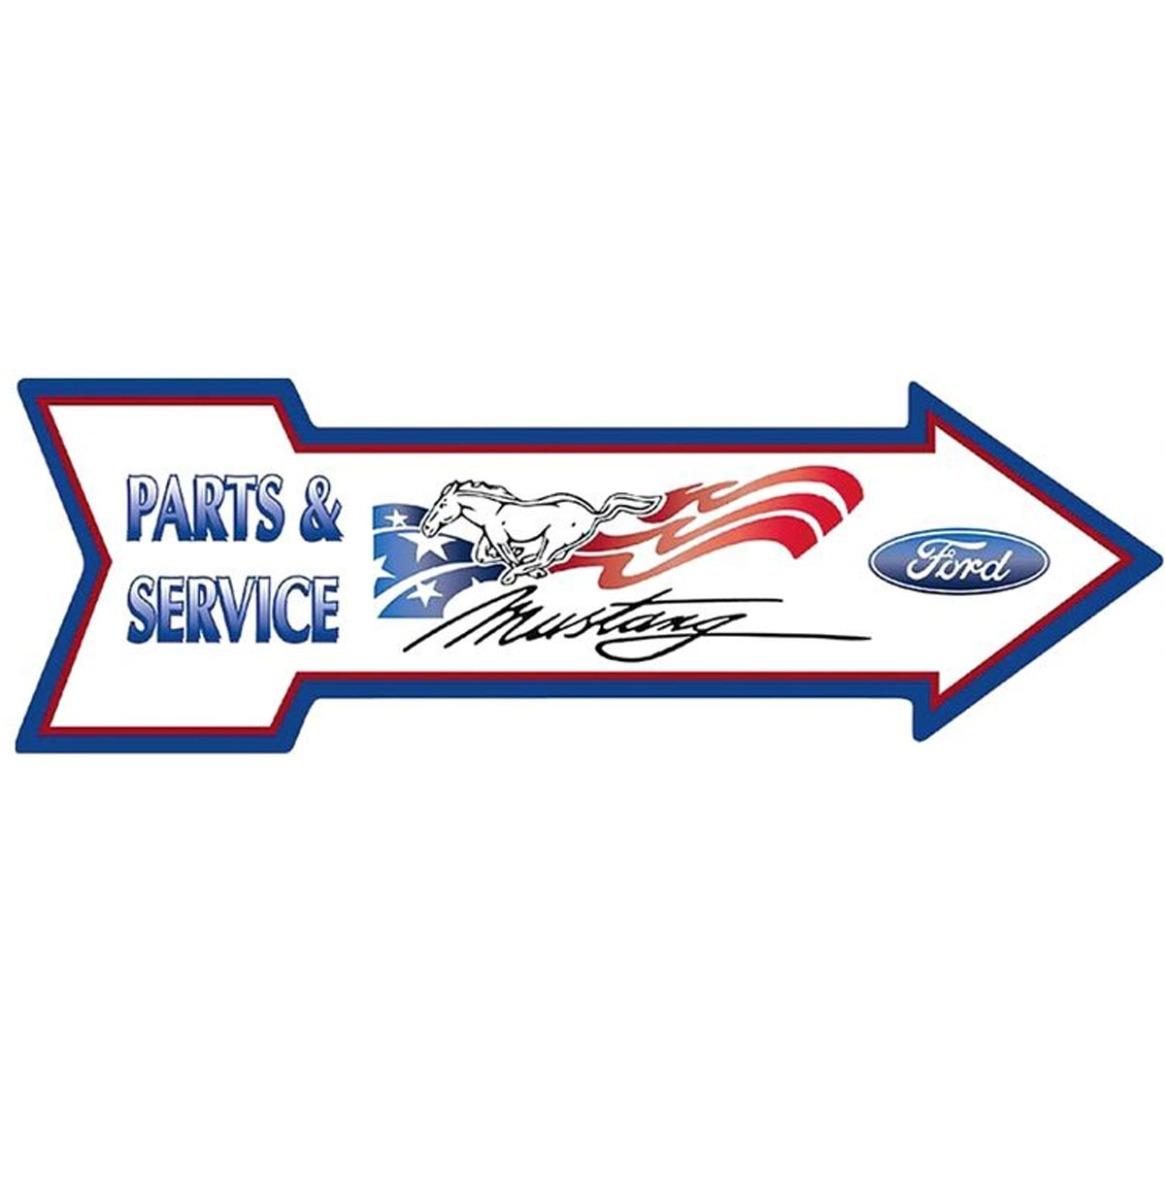 Ford Mustang Parts & Service Pijl Aluminium Bord 69 x 21 cm